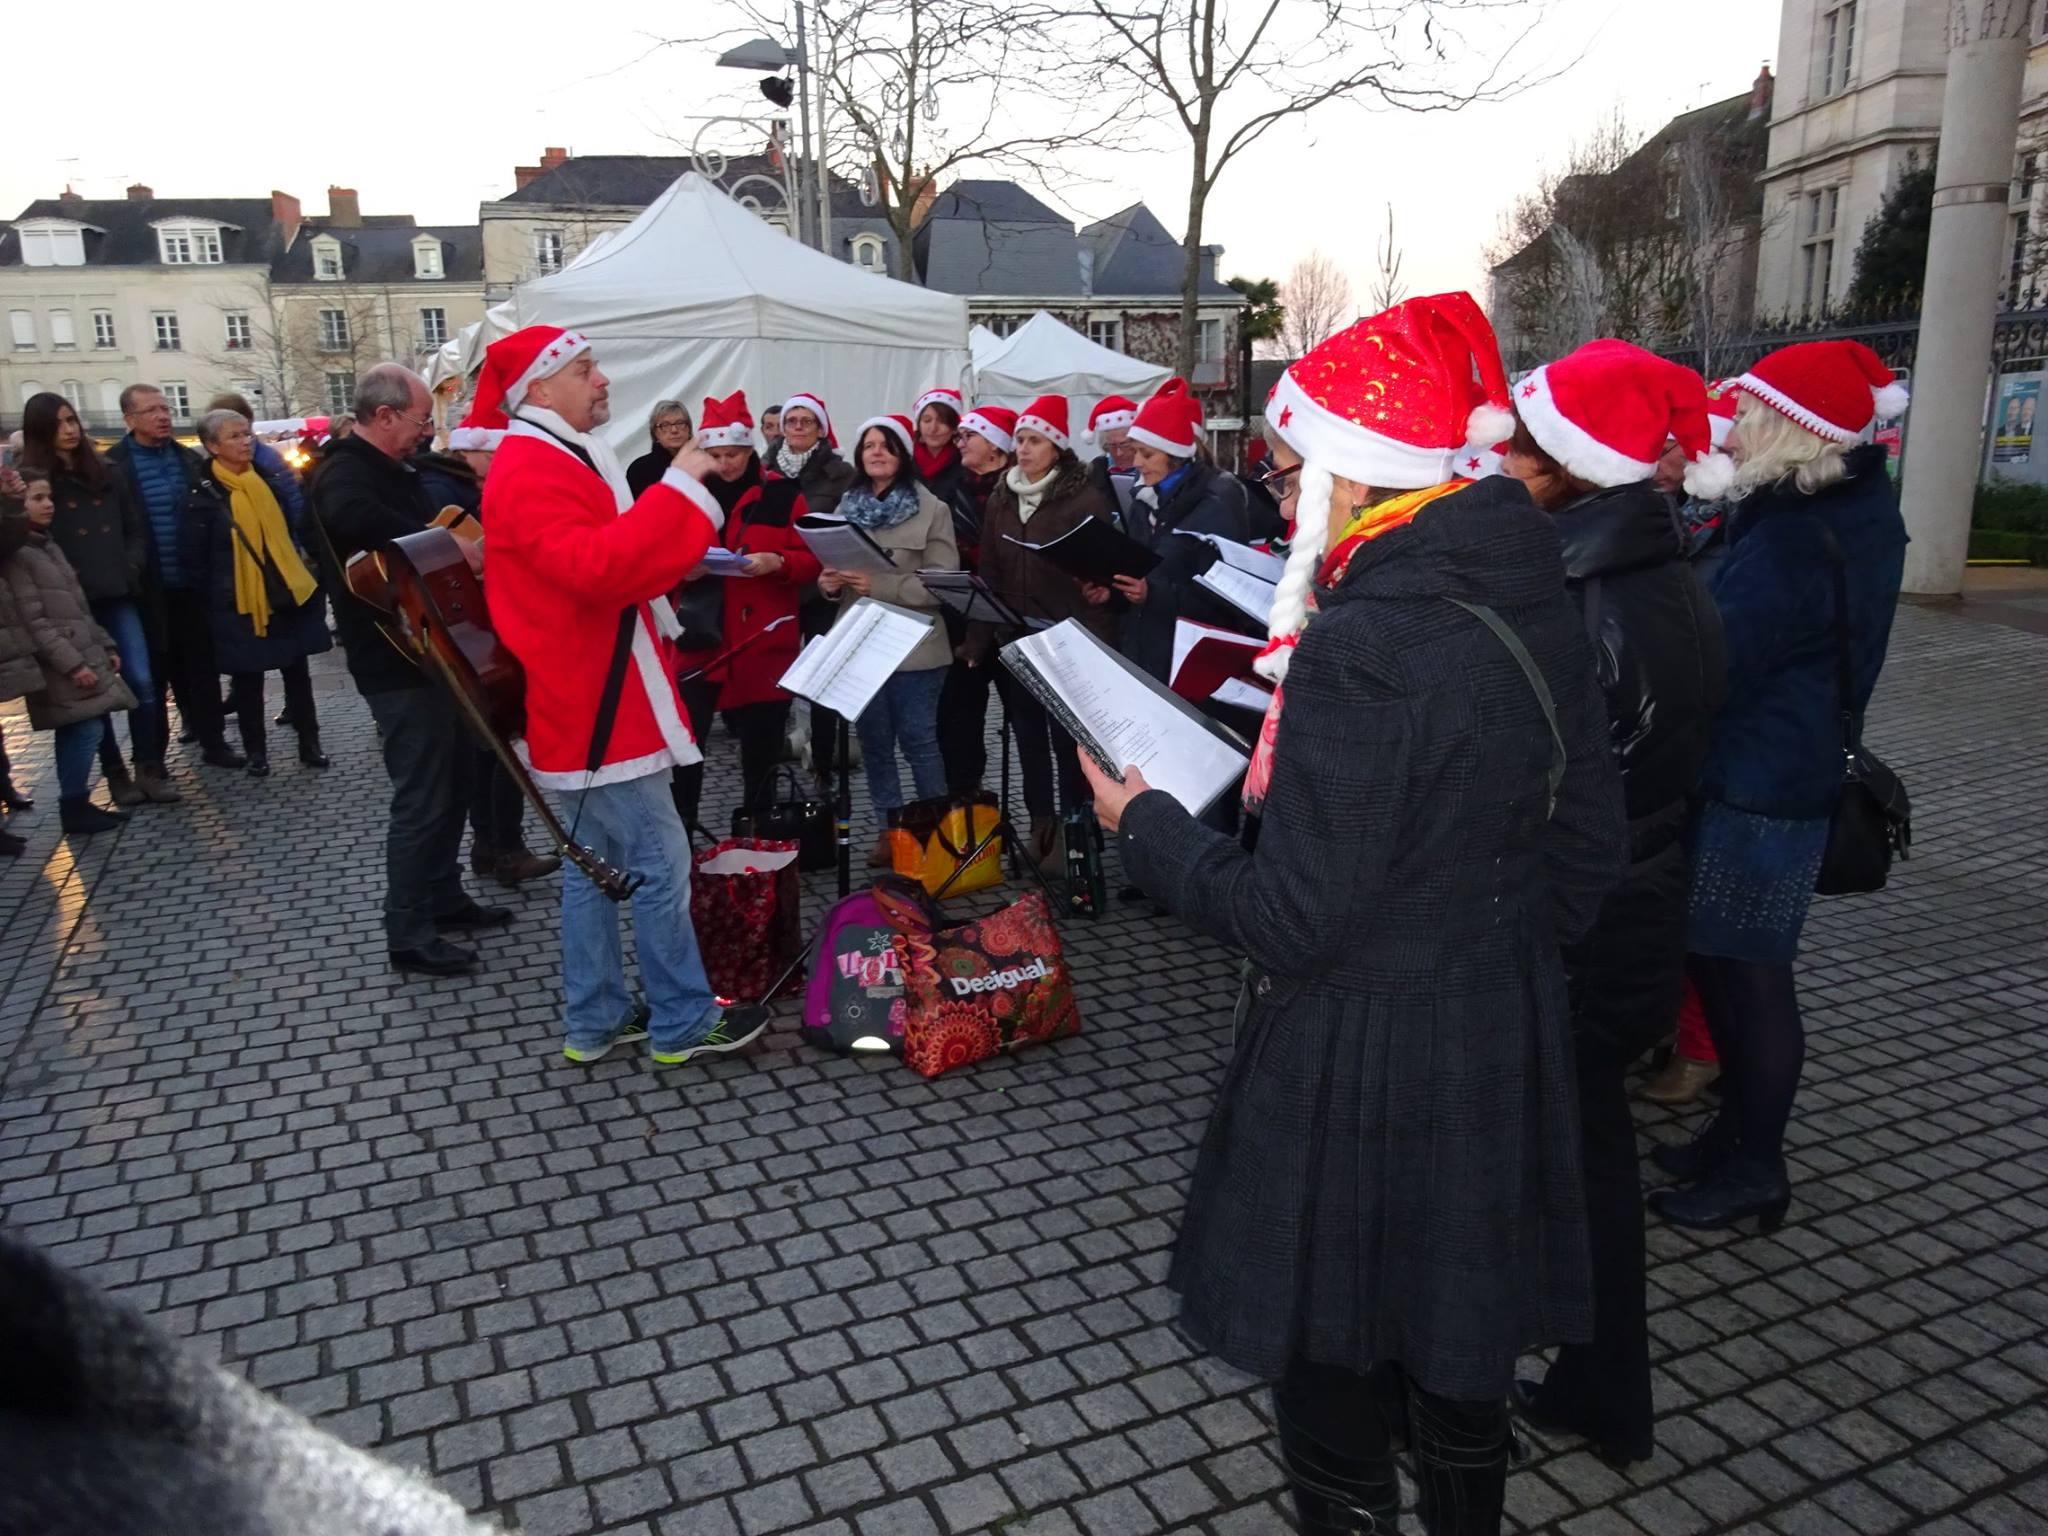 2015-12-12 – Au marché de Noël (10) Sabrina